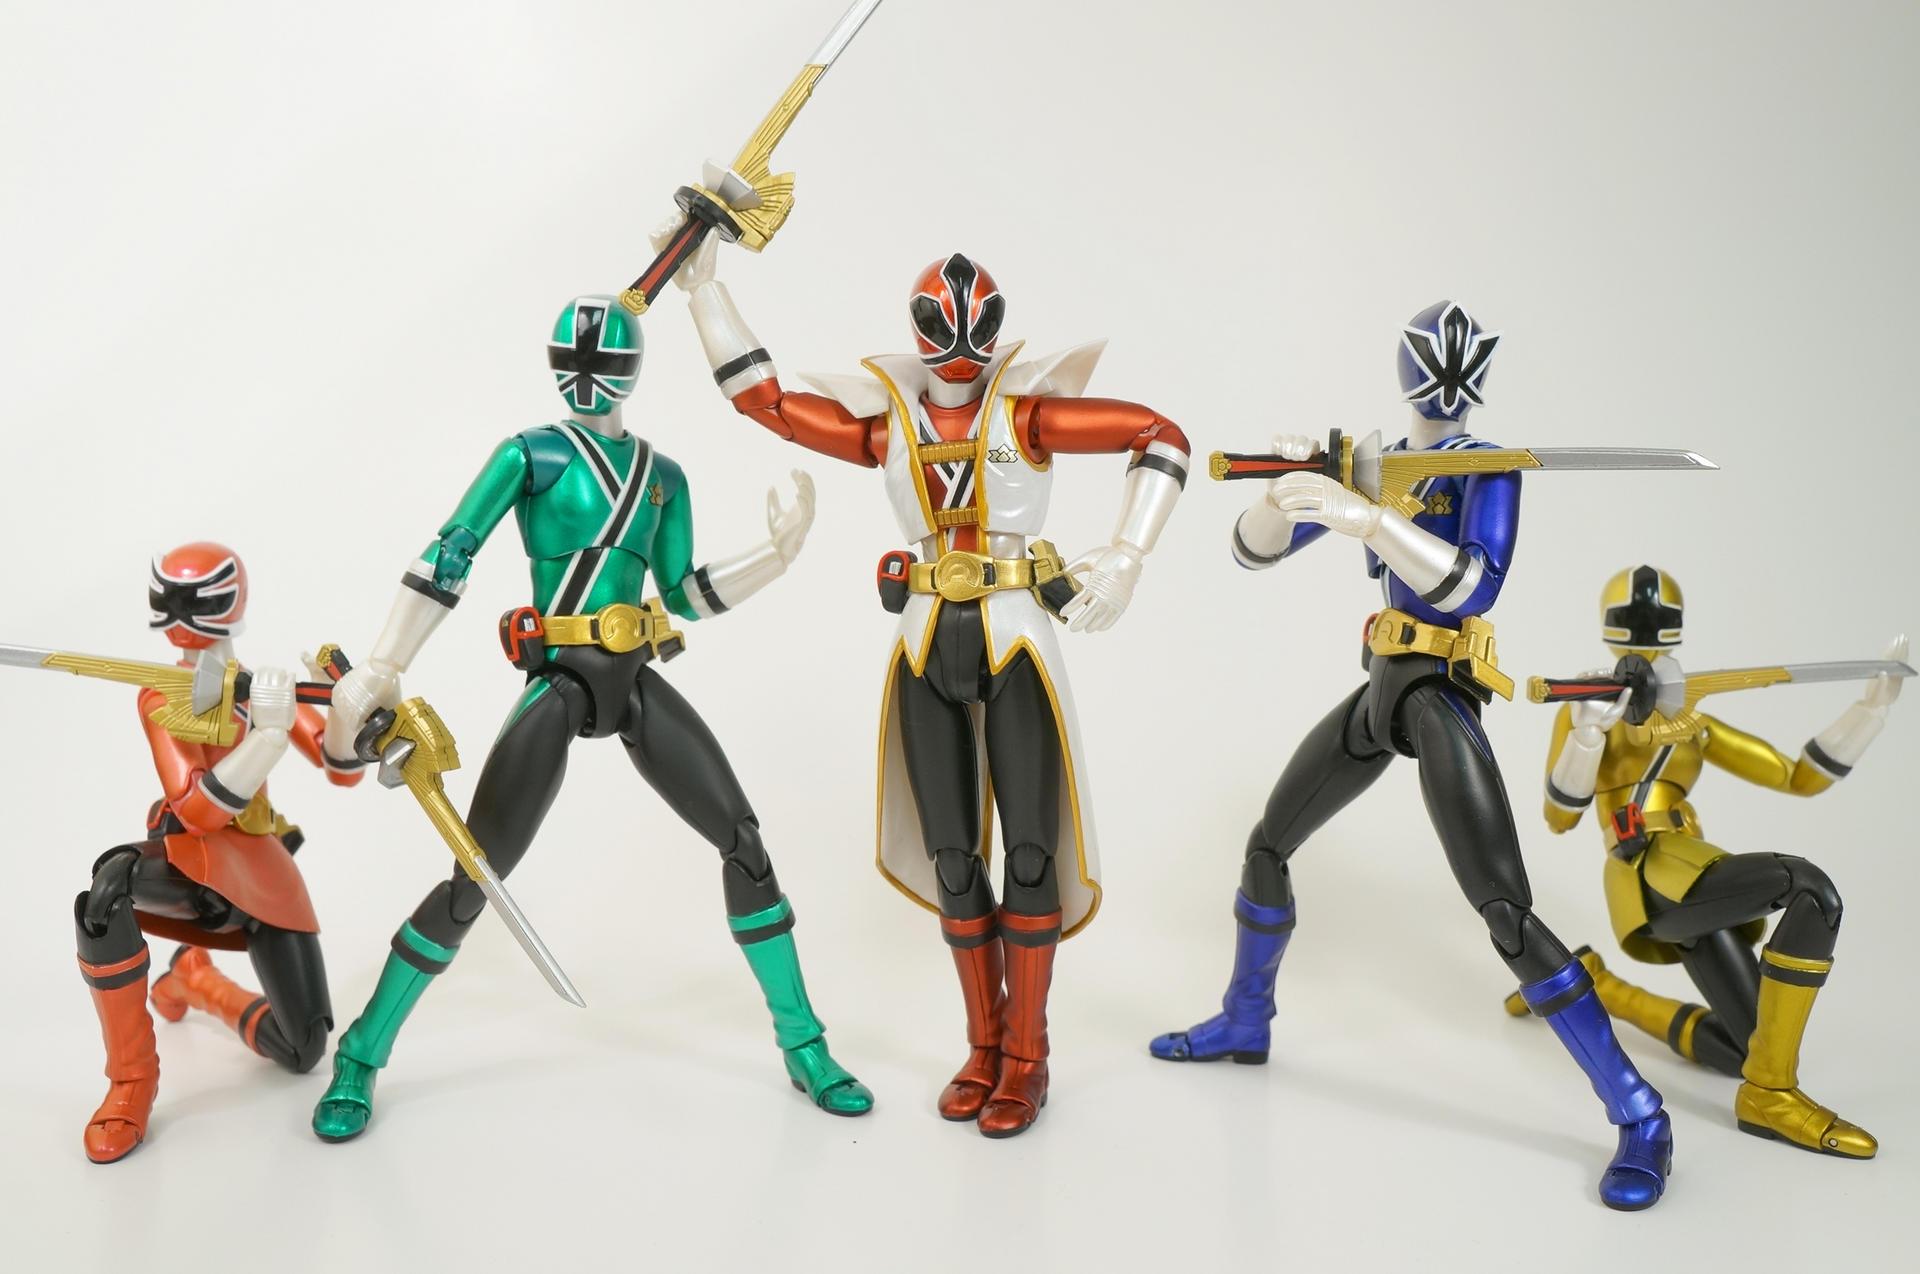 S.H Figuarts Power Rangers Super Samurai metallic box set SDCC 2013 Tamashii